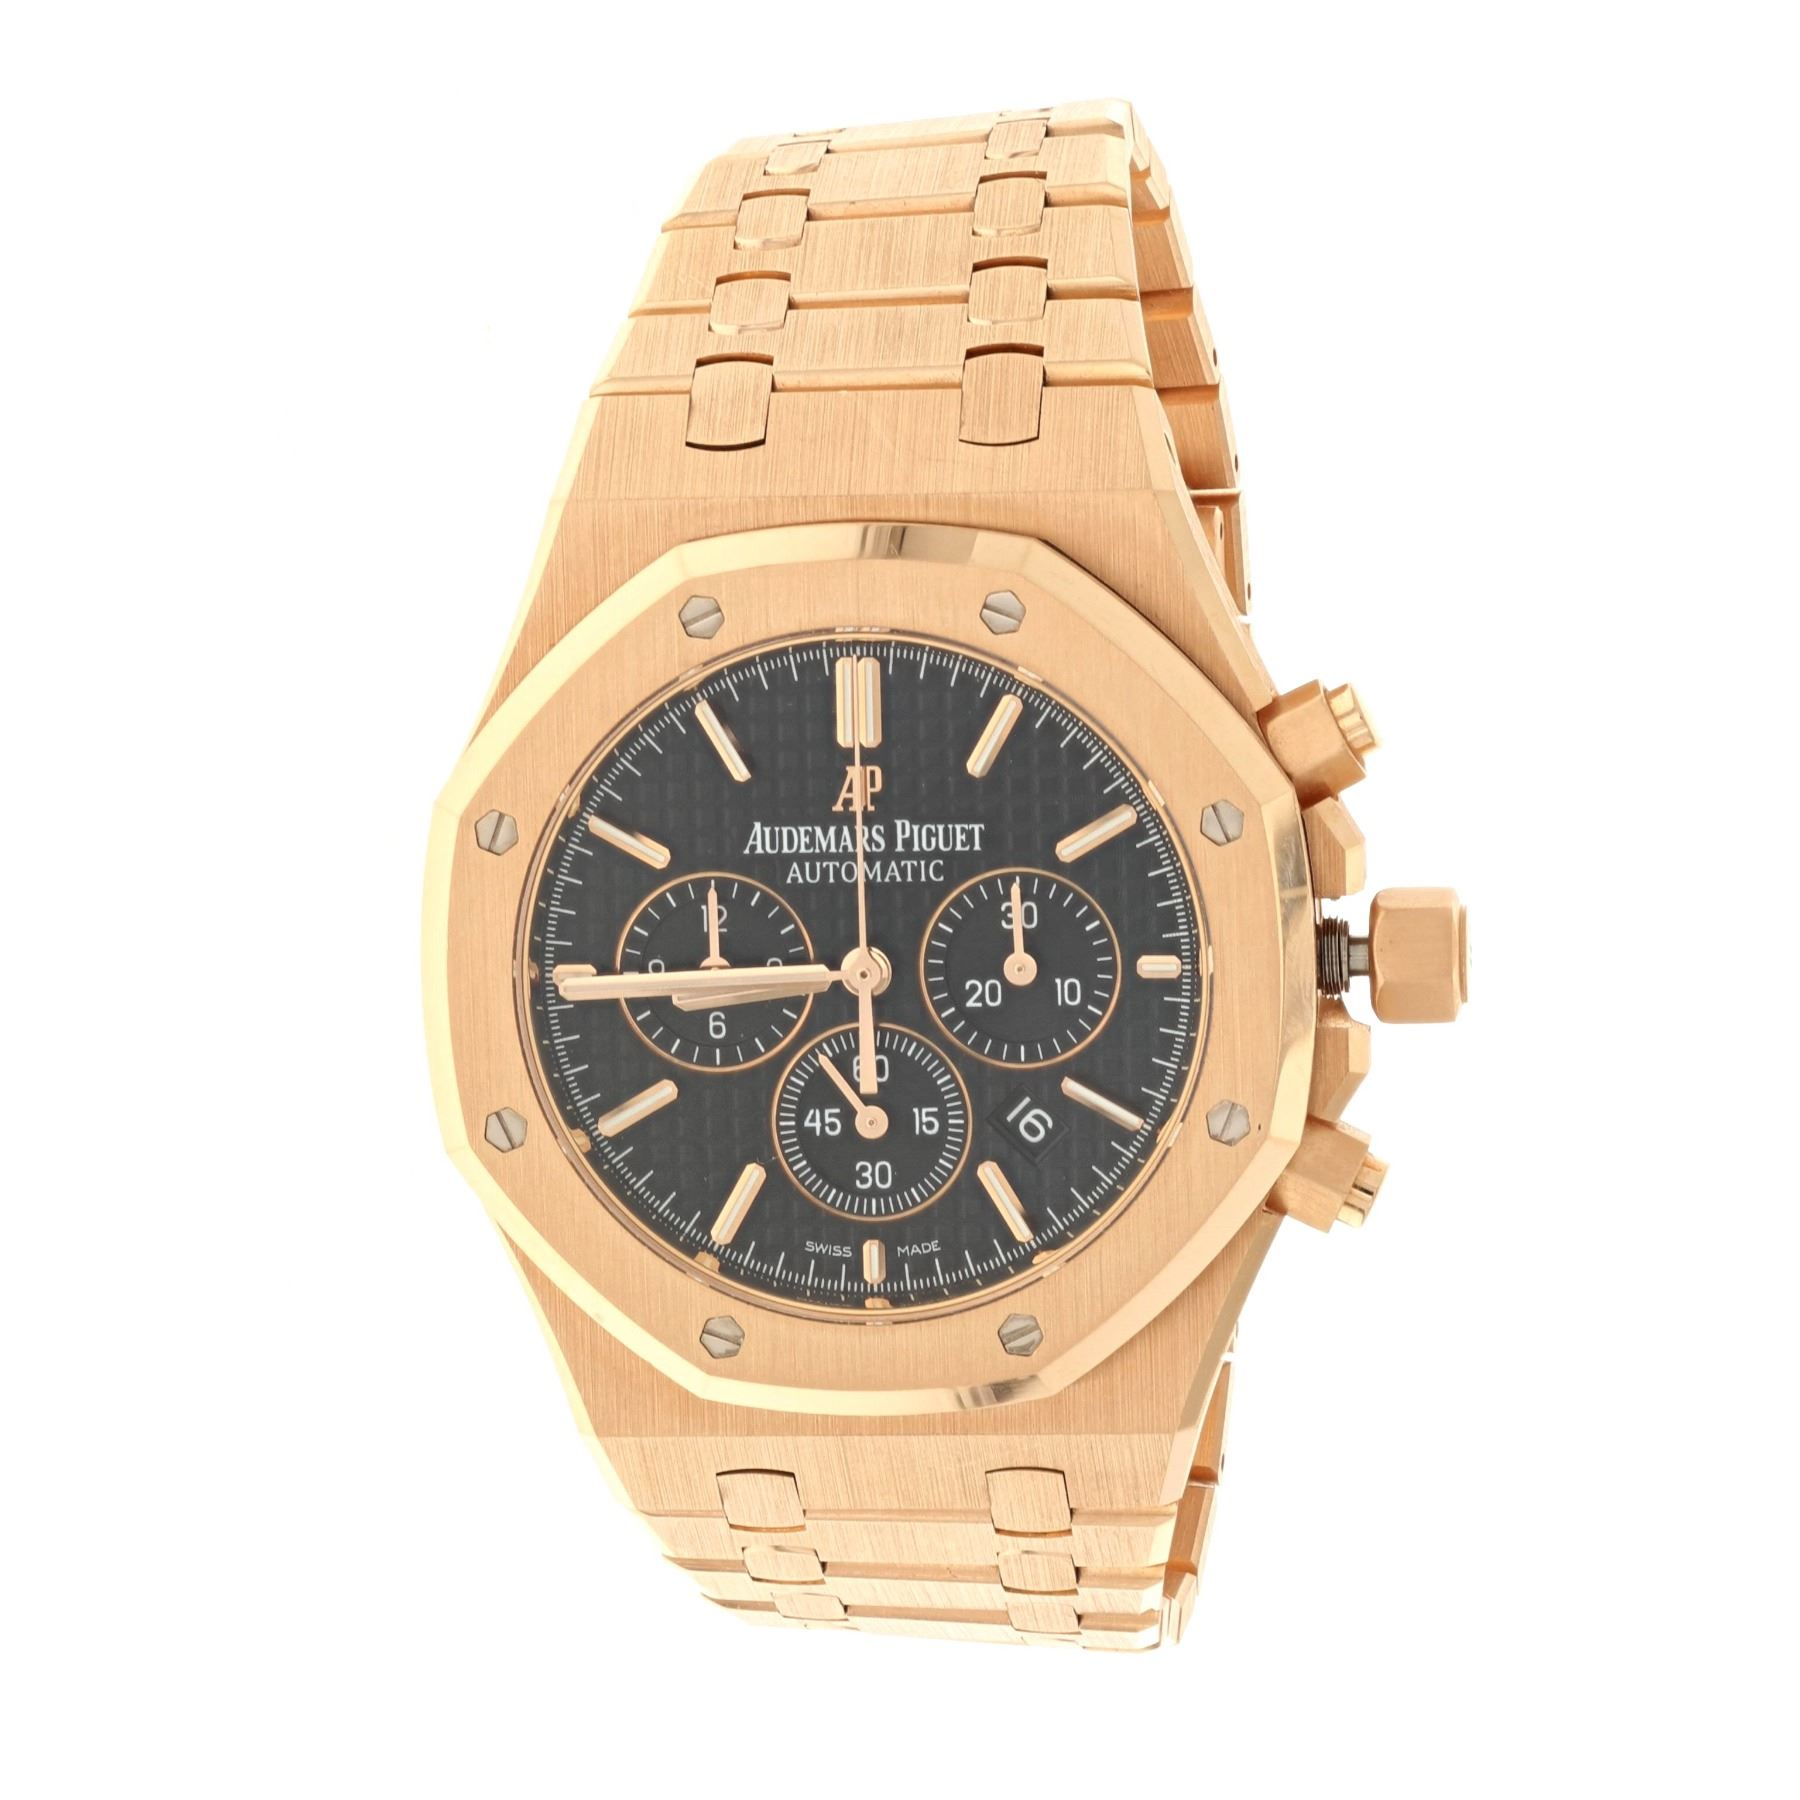 b6e4bd13e48 Image 1   WATCH  18k rose gold Audemars Piguet Royal Oak Chronograph 50M  watch  ...